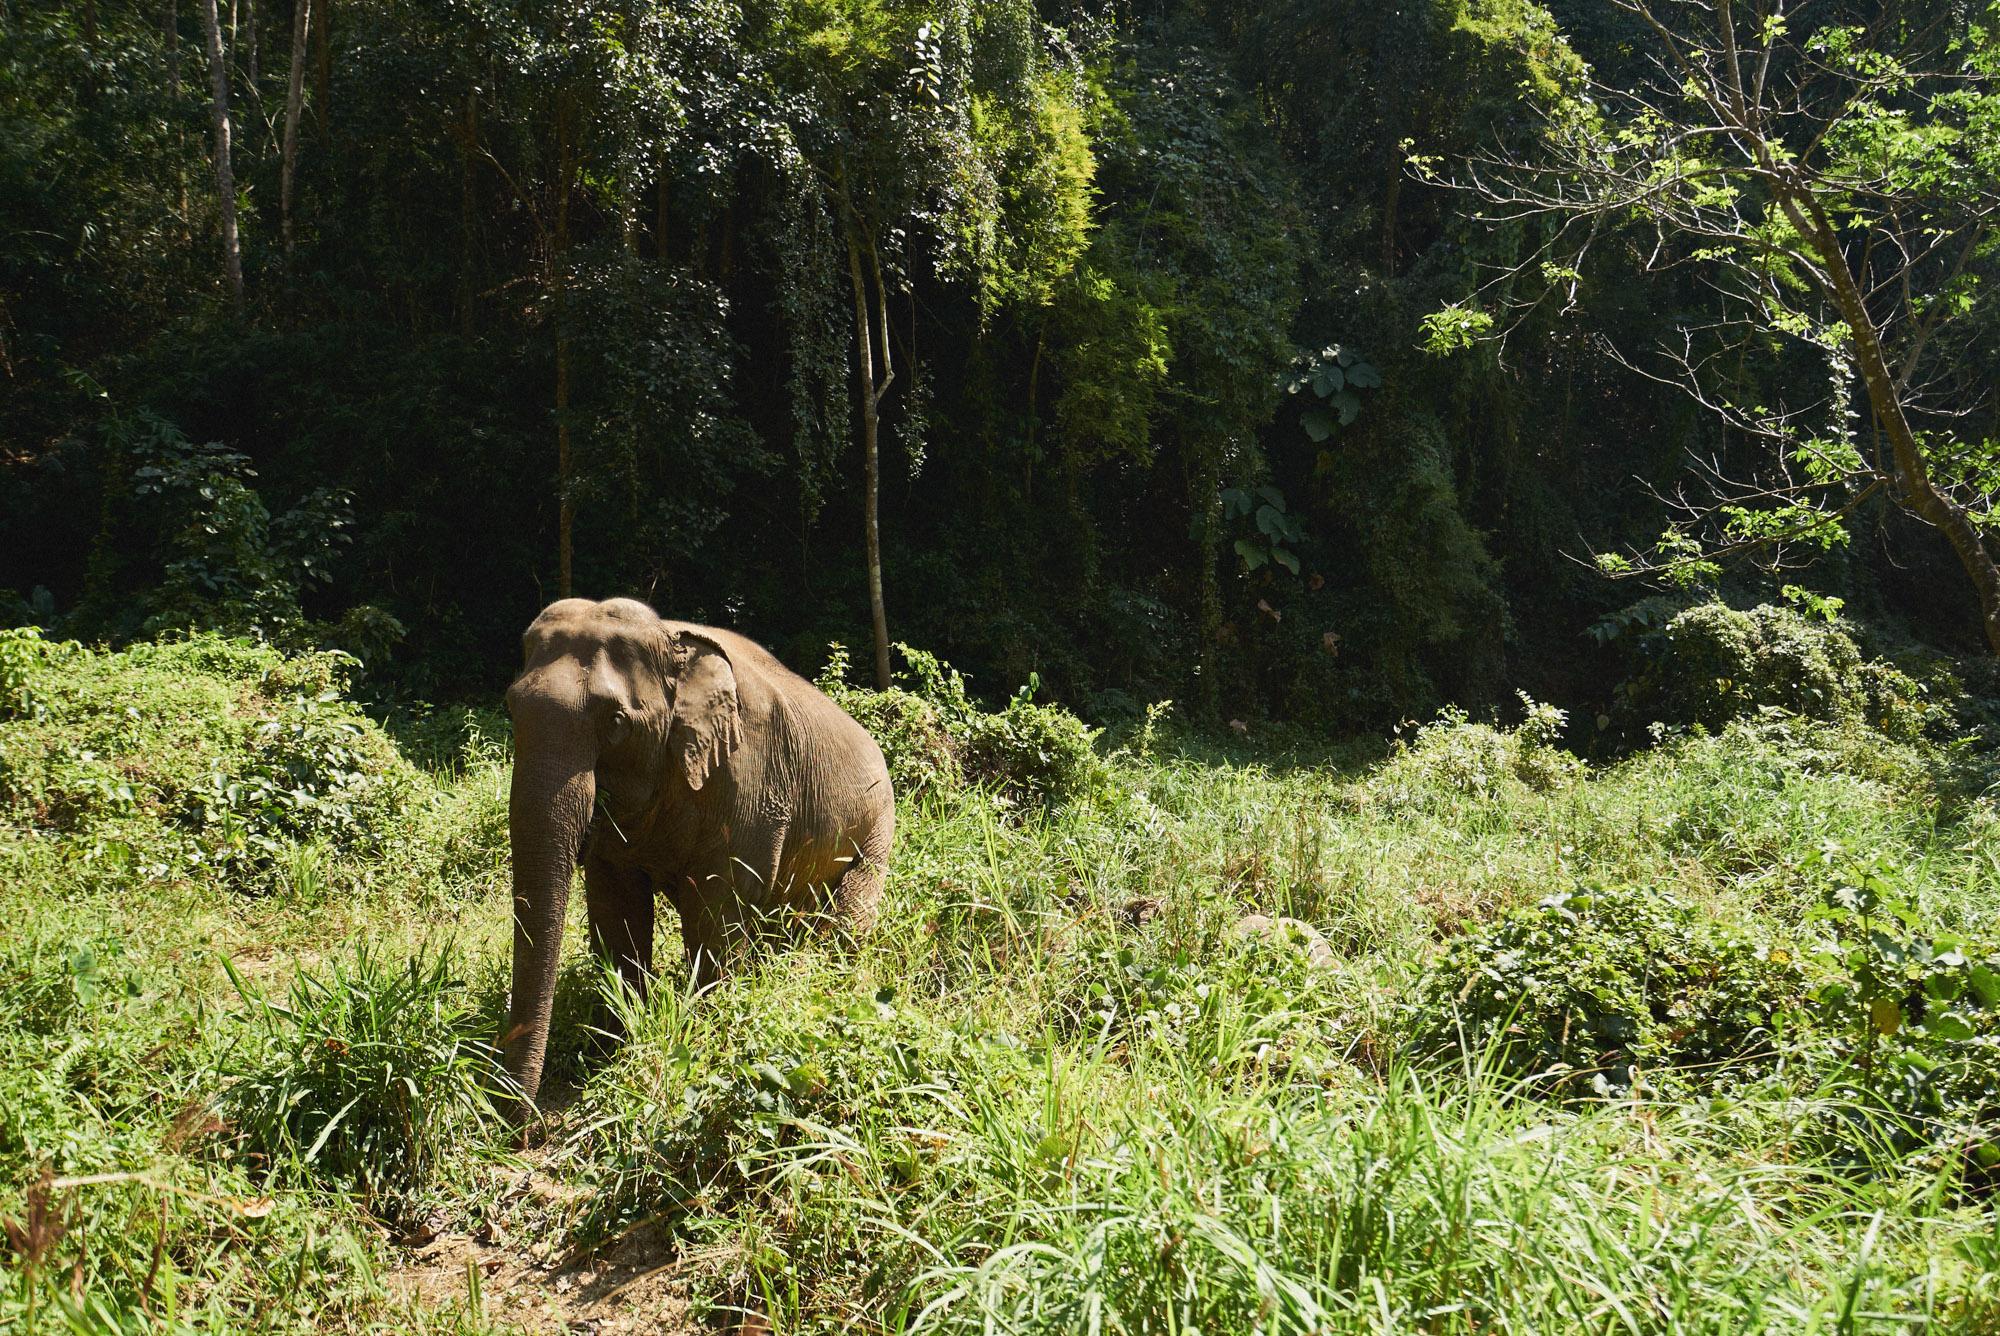 wesley_elephant_park_thailand-23